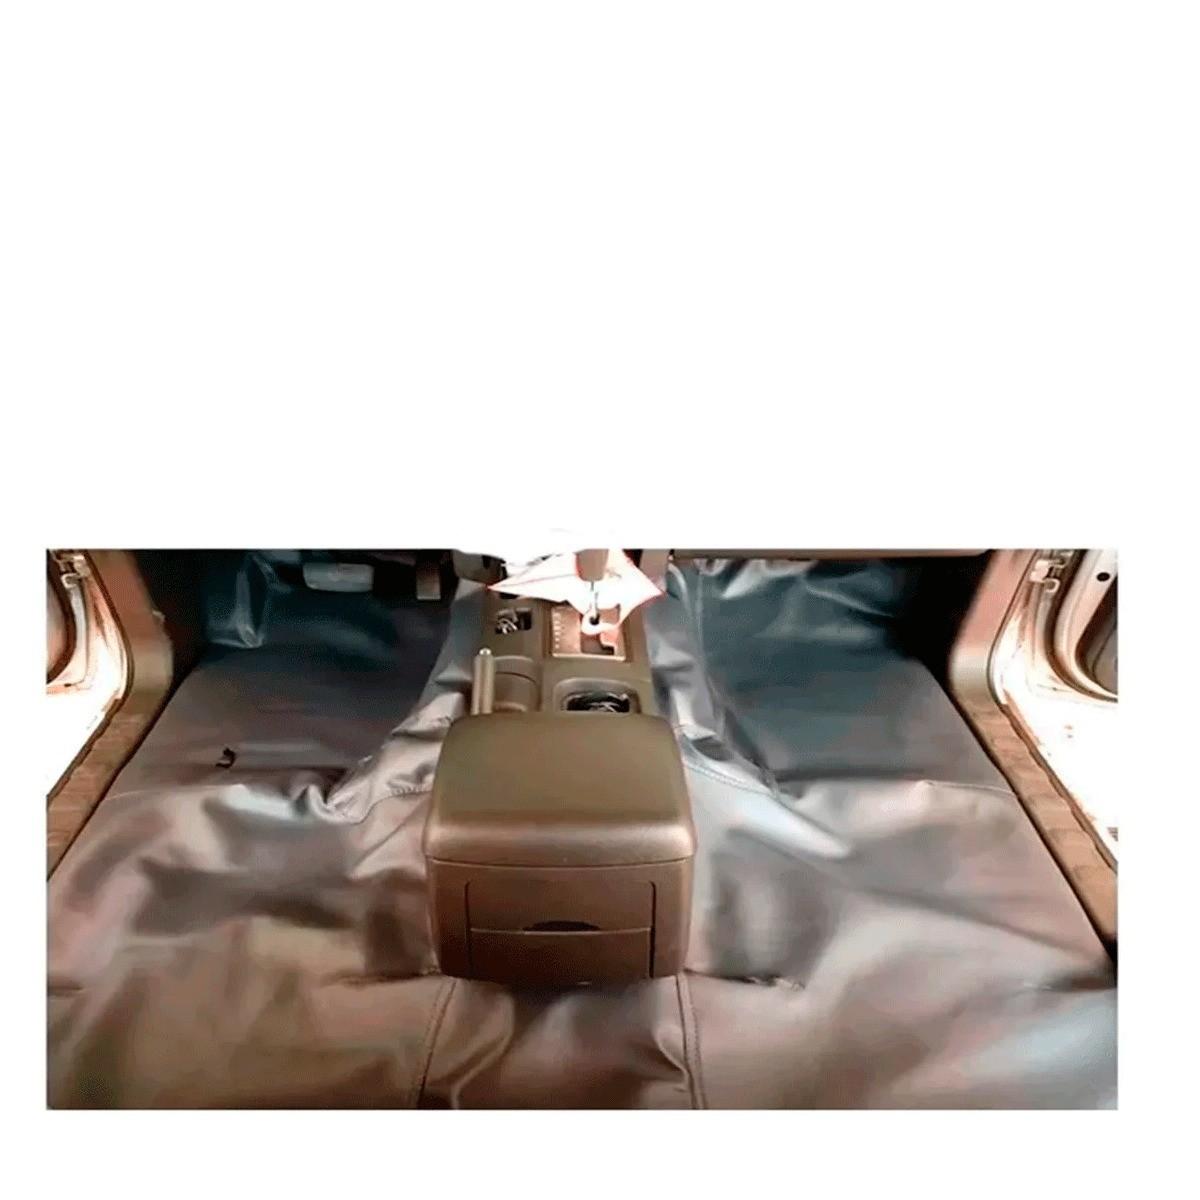 Tapete Automotivo Assoalho Emborrachado Bidim Volkswagen Gol G4